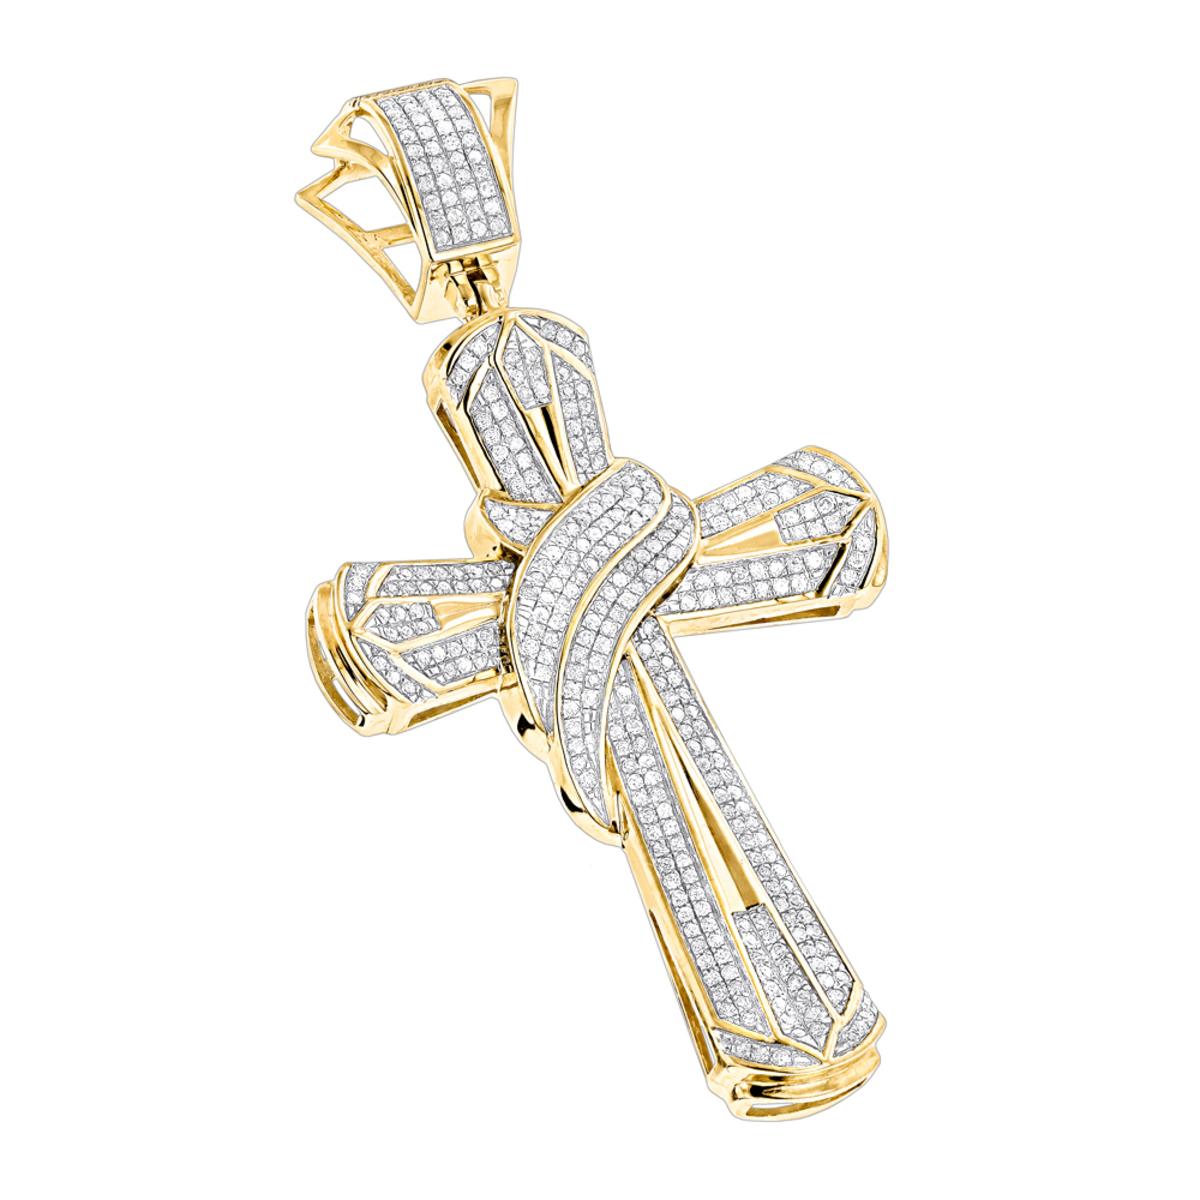 Hip Hop Jewelry Large 10K Gold Mens Diamond Cross Necklace Pendant